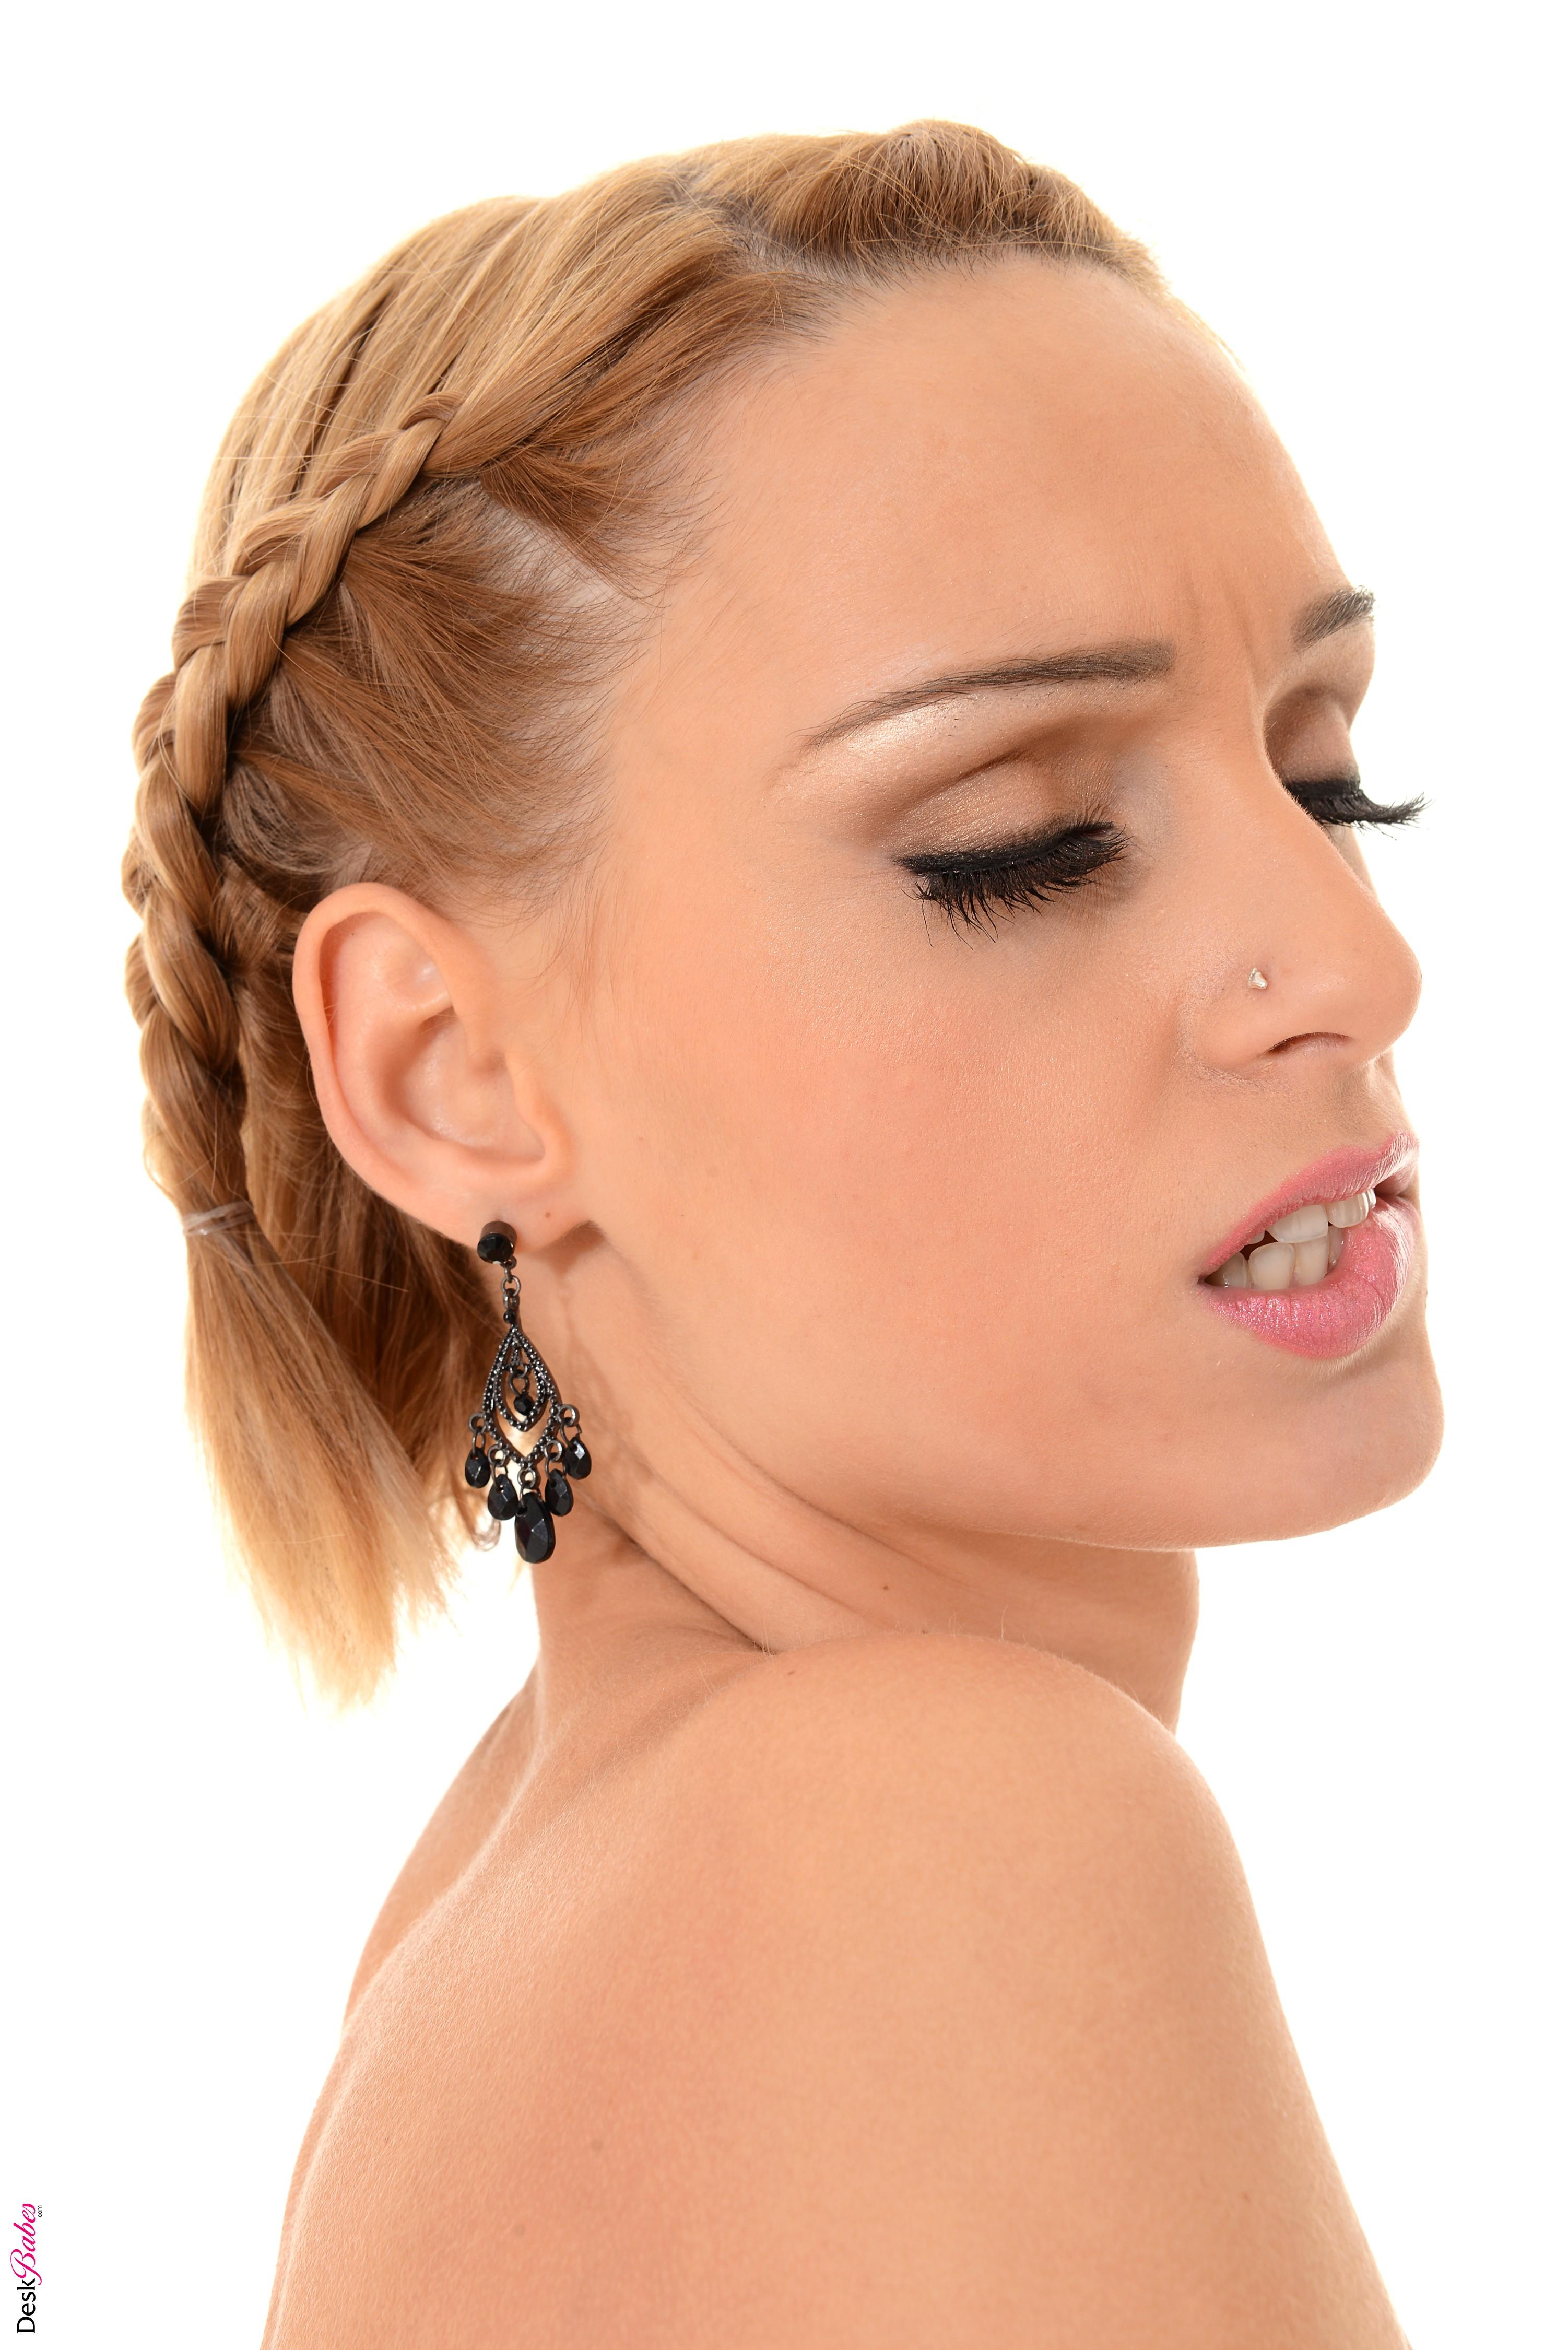 Erica Fontes, blonde, biting lip, women, pornstar | 3003x4500 Wallpaper - wallhaven.cc